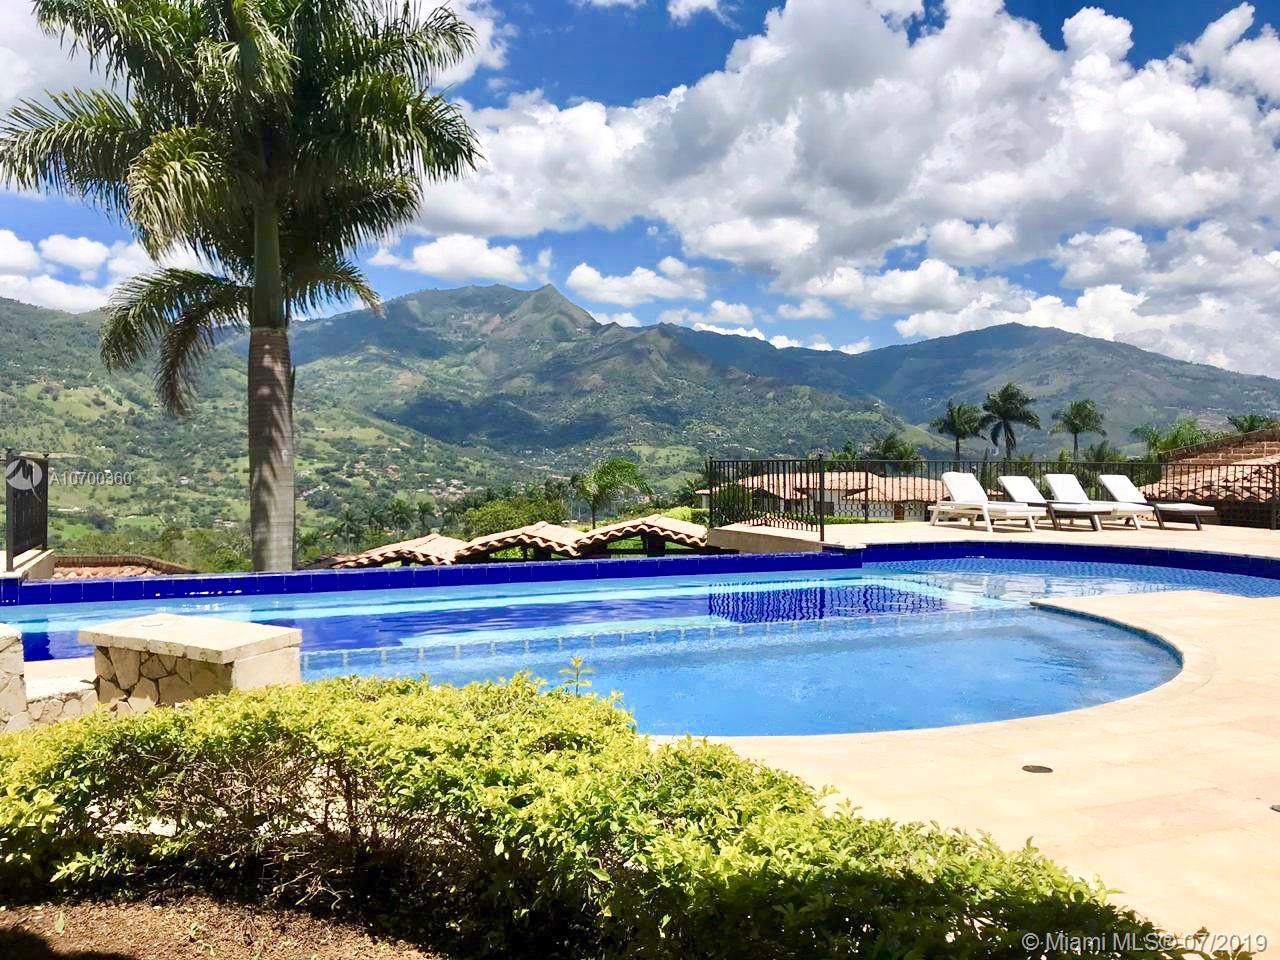 Sierra Linda Medellin, Colombia - Photo 1